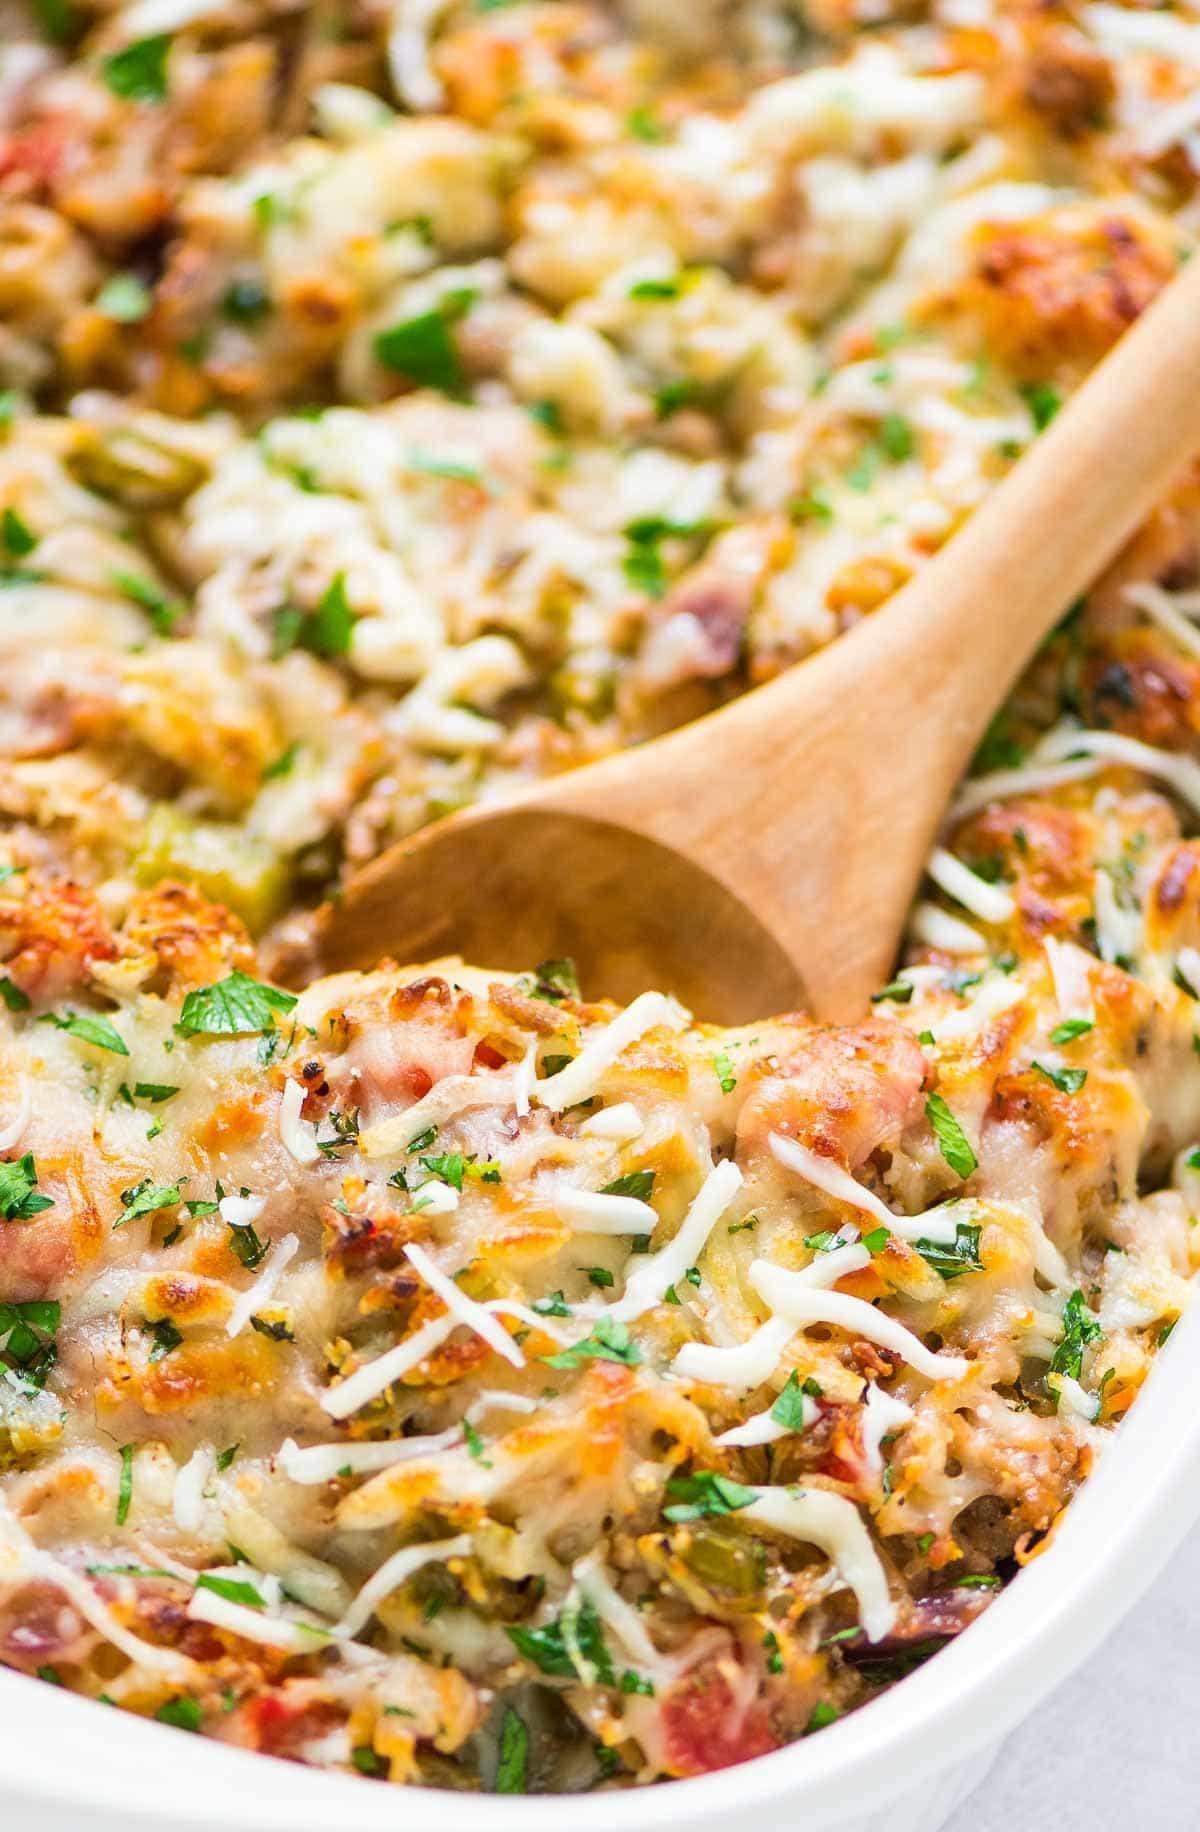 Healthy Squash Casserole  Healthy Spaghetti Squash Casserole